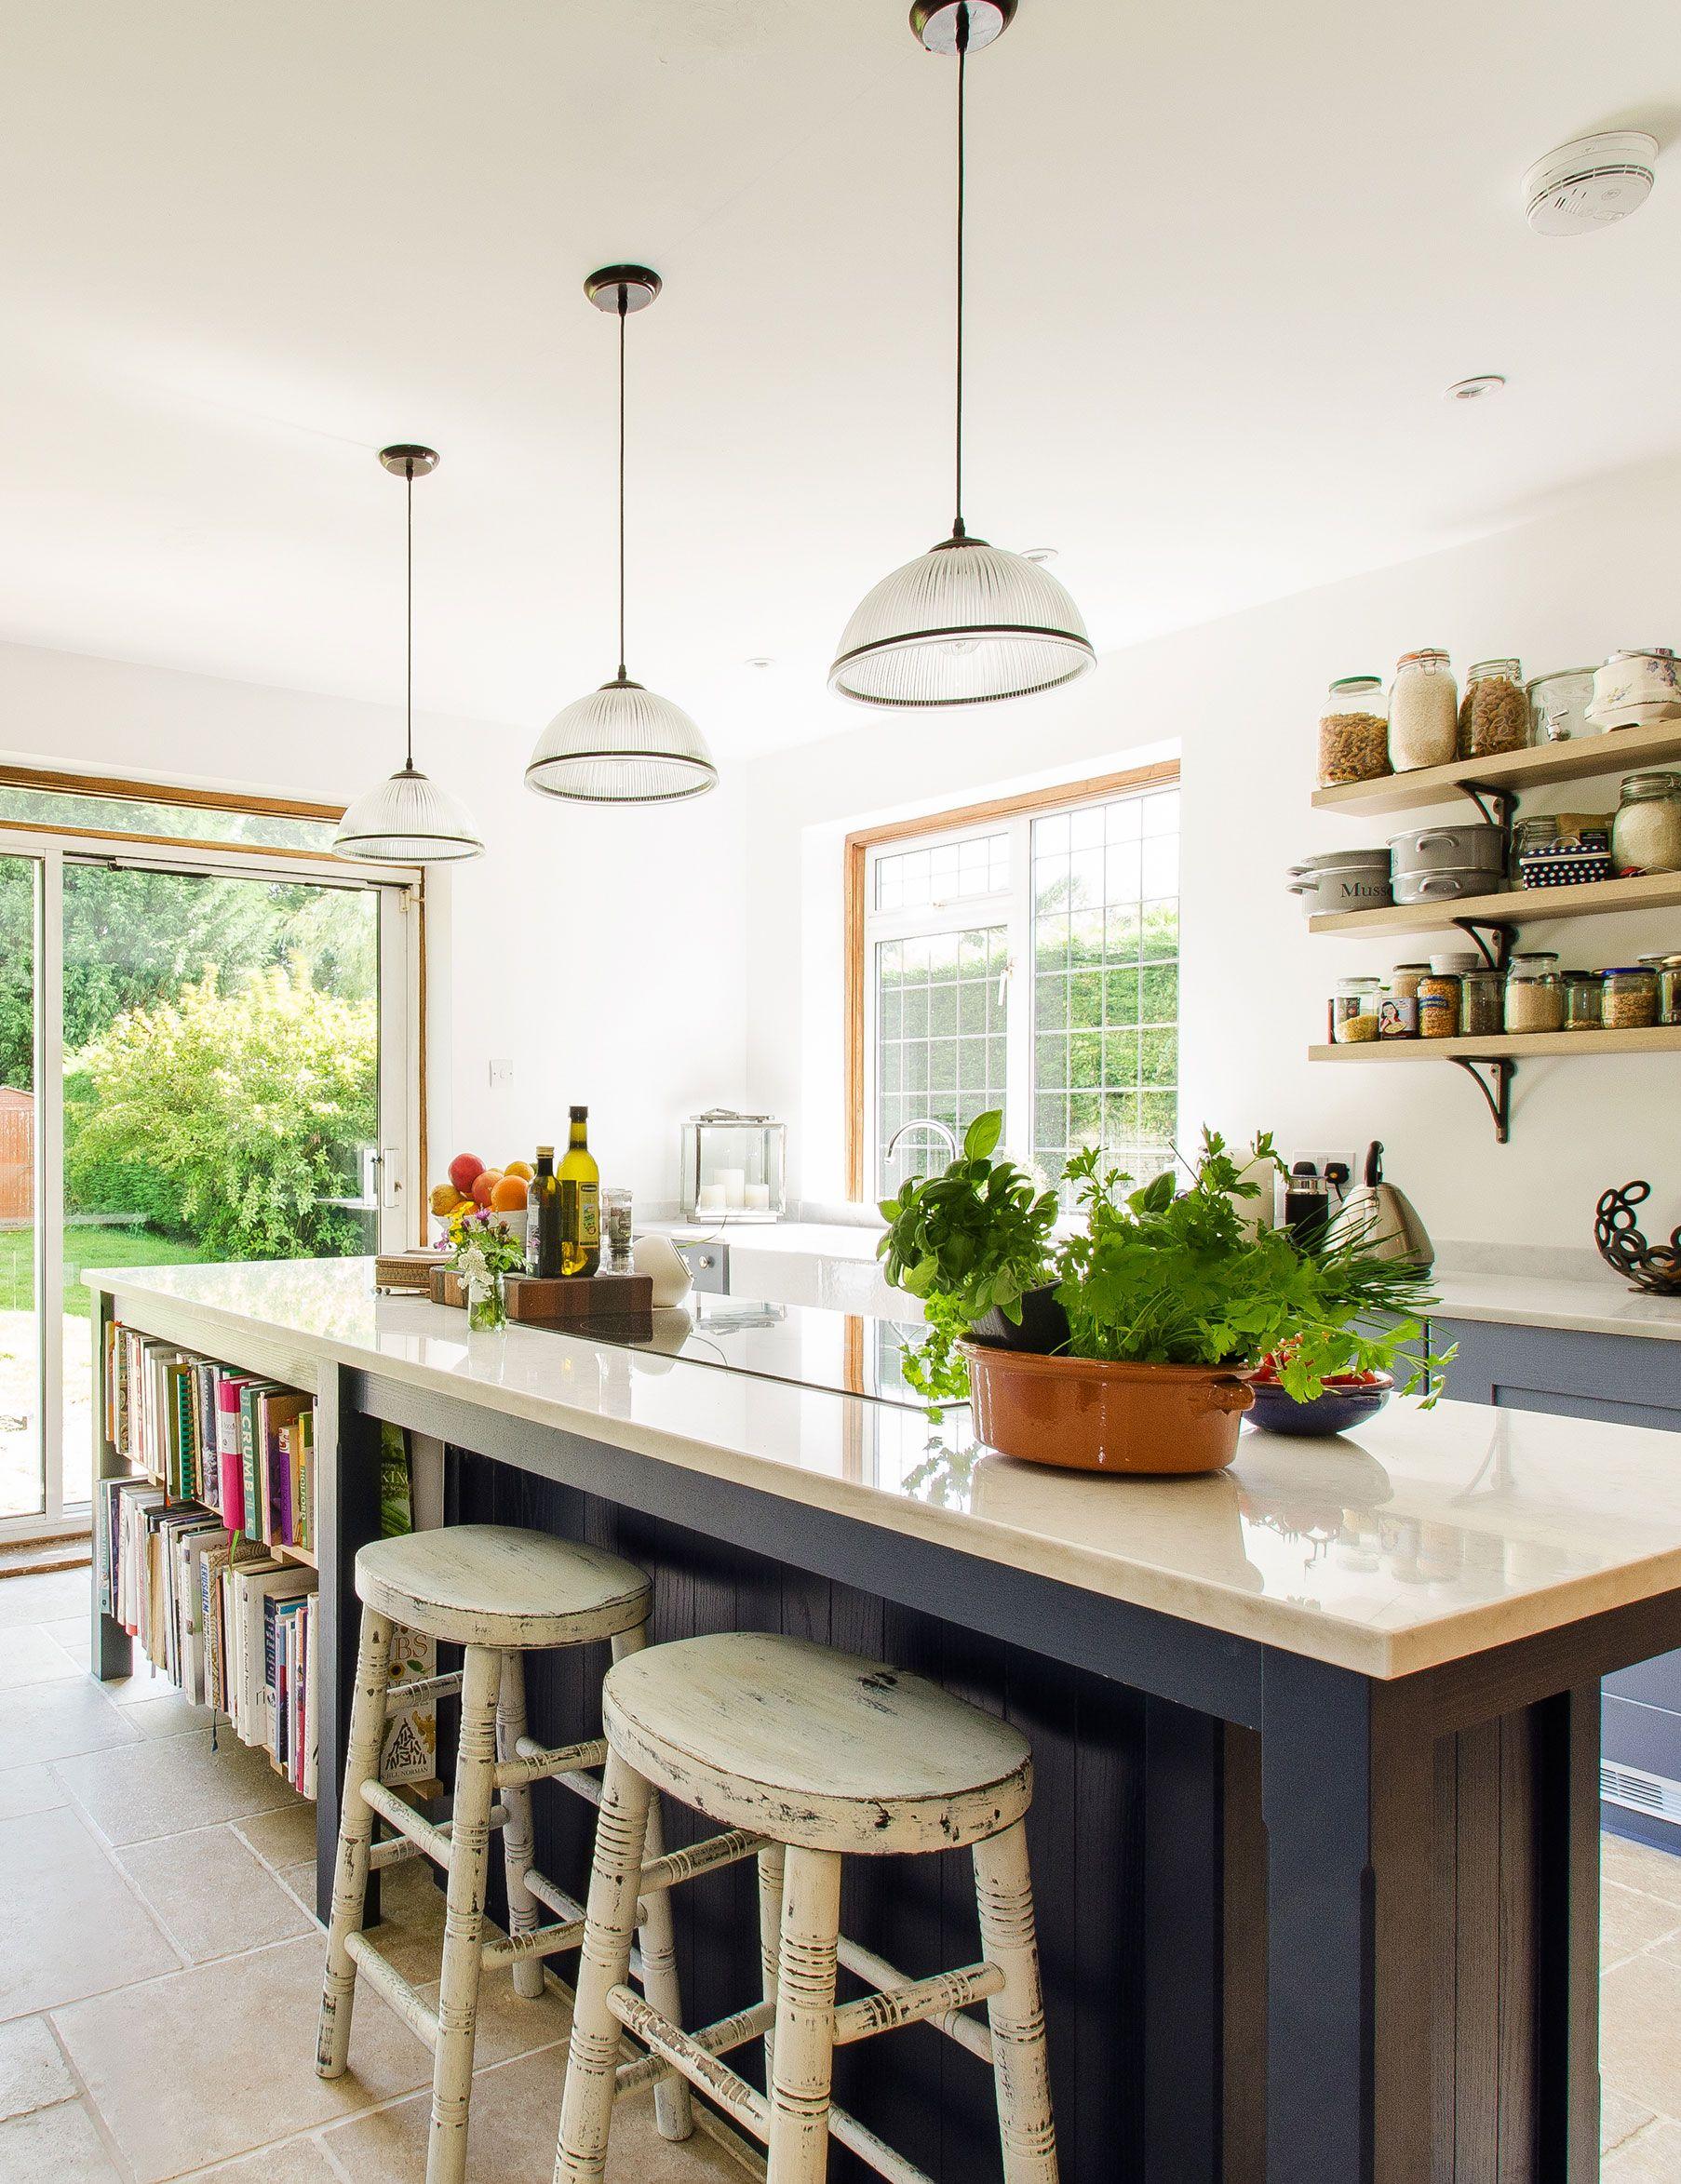 Herringbone Kitchens - House & Garden, The List | Kitchen ...